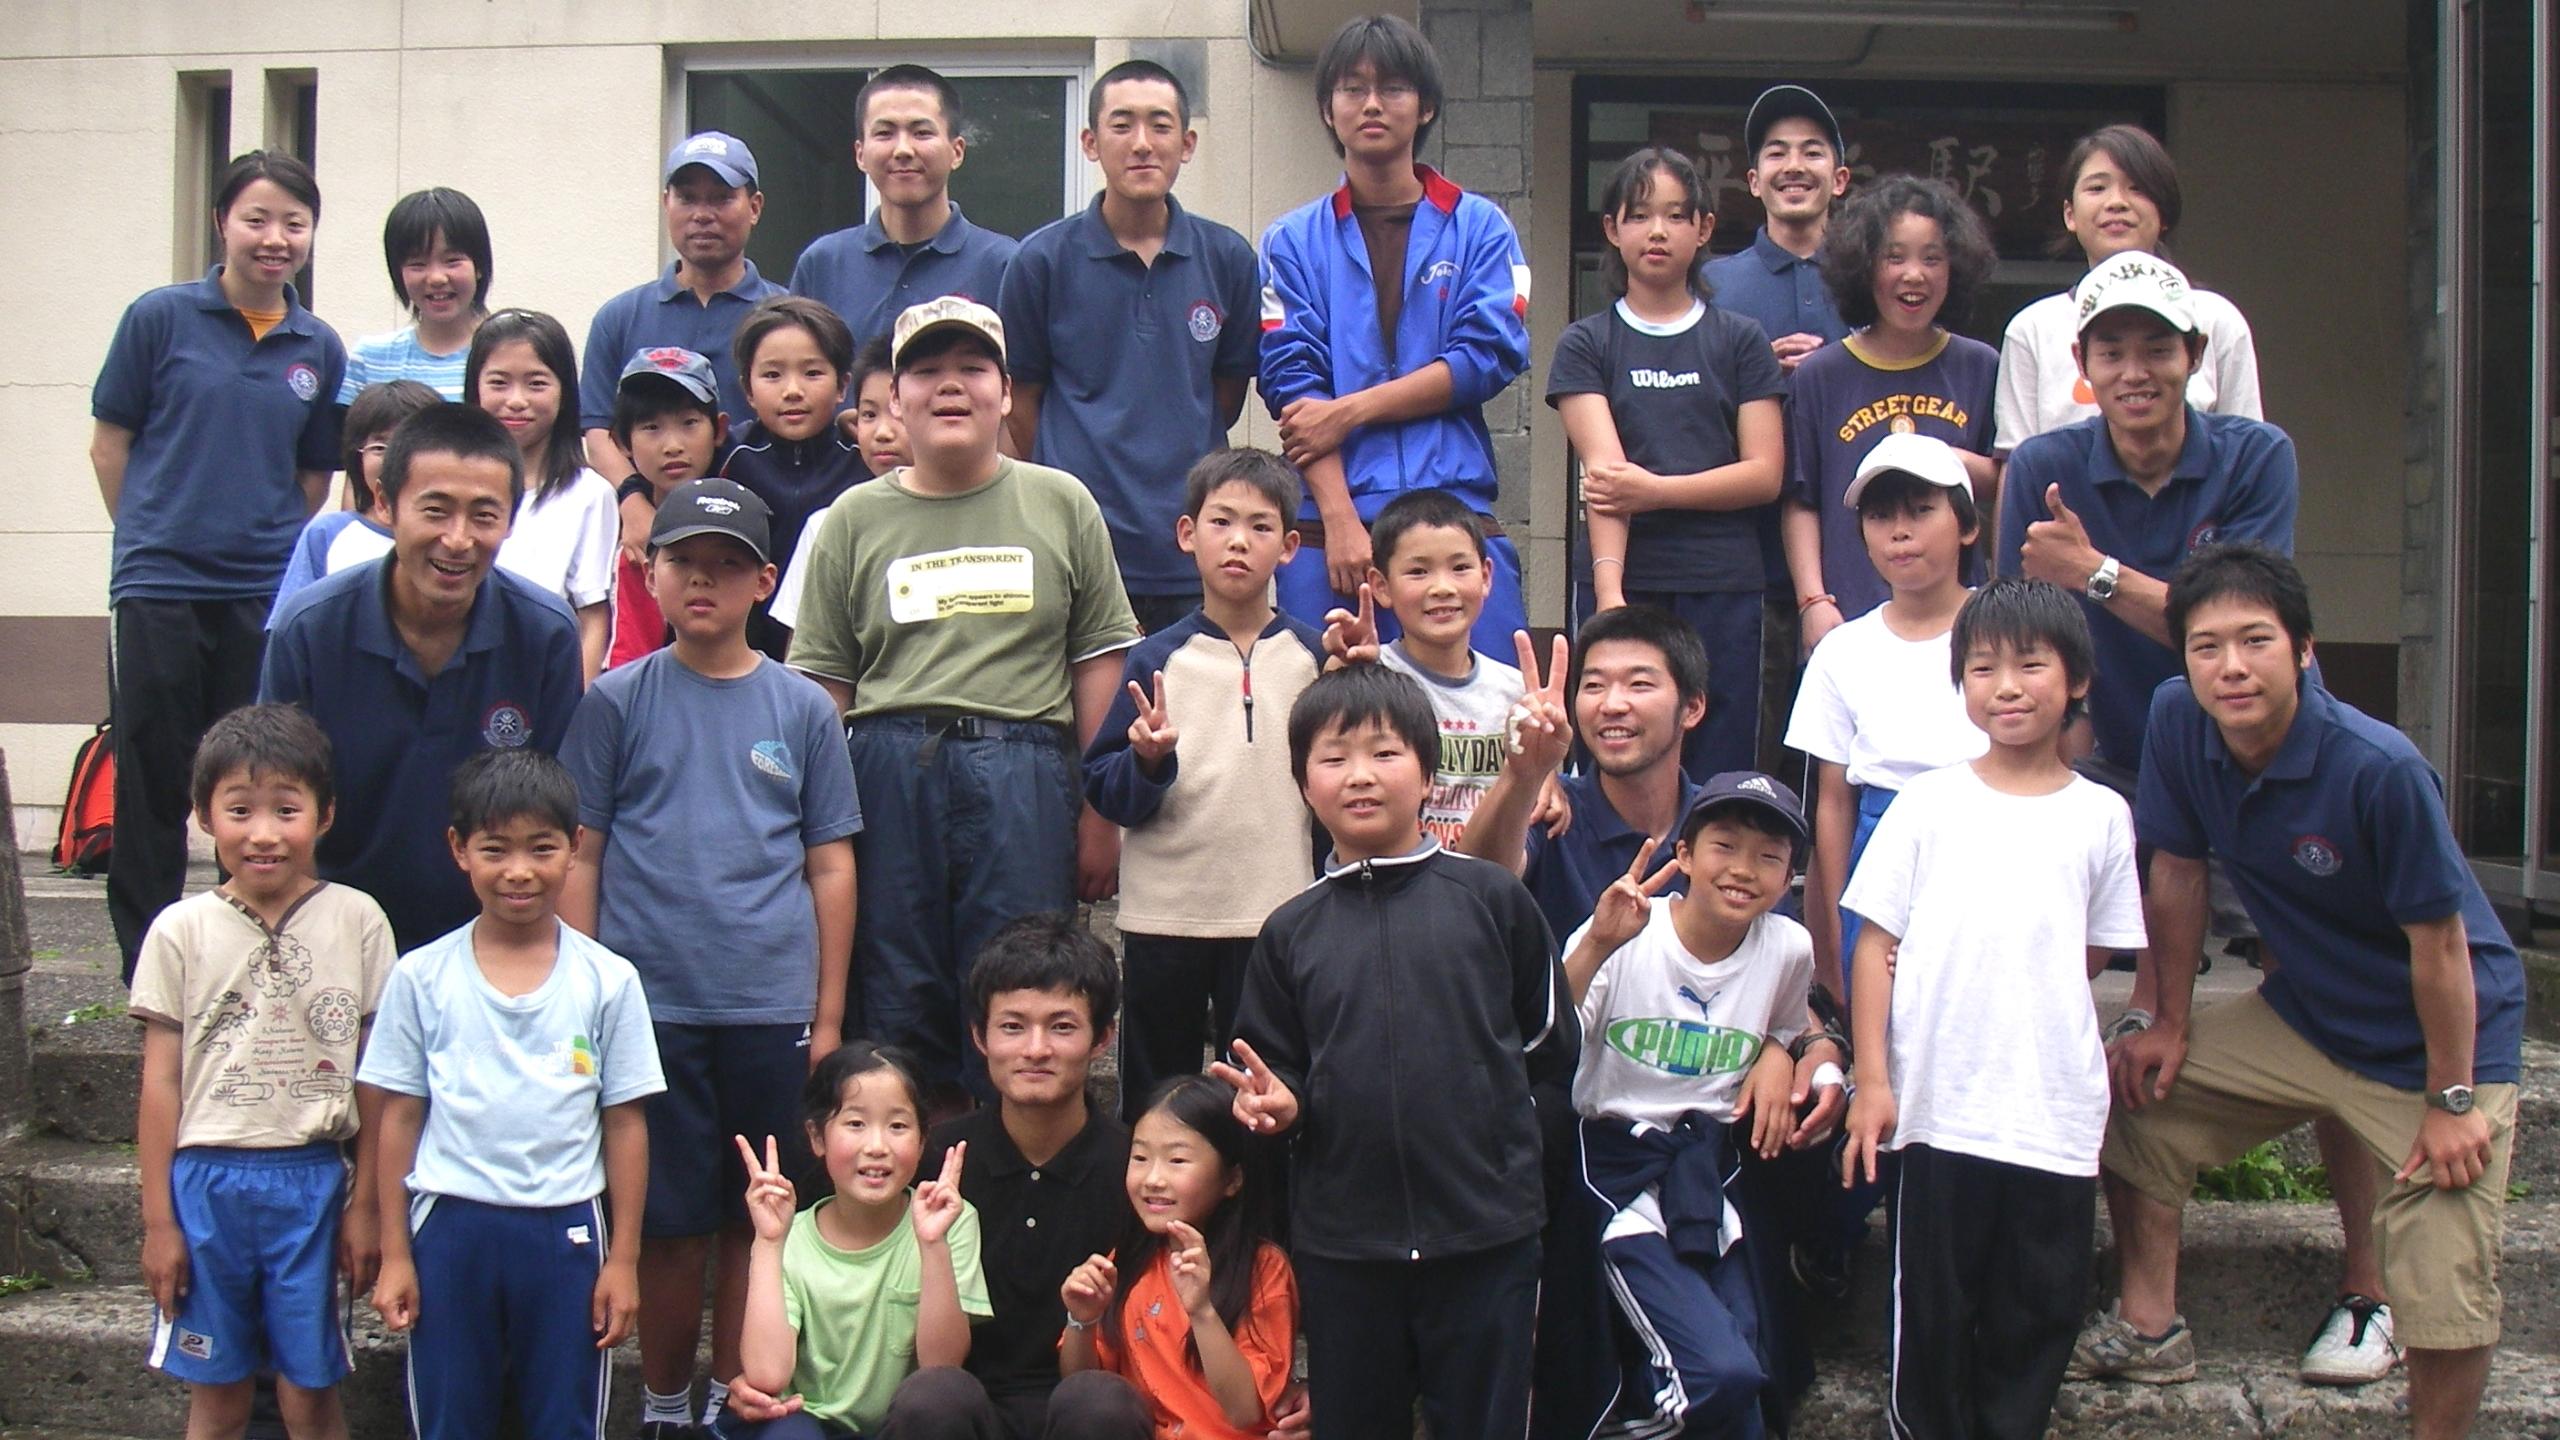 OBS-JALT2006-67日目:指導実習無事終了!子供の可能性に感動!笑顔でお別れ